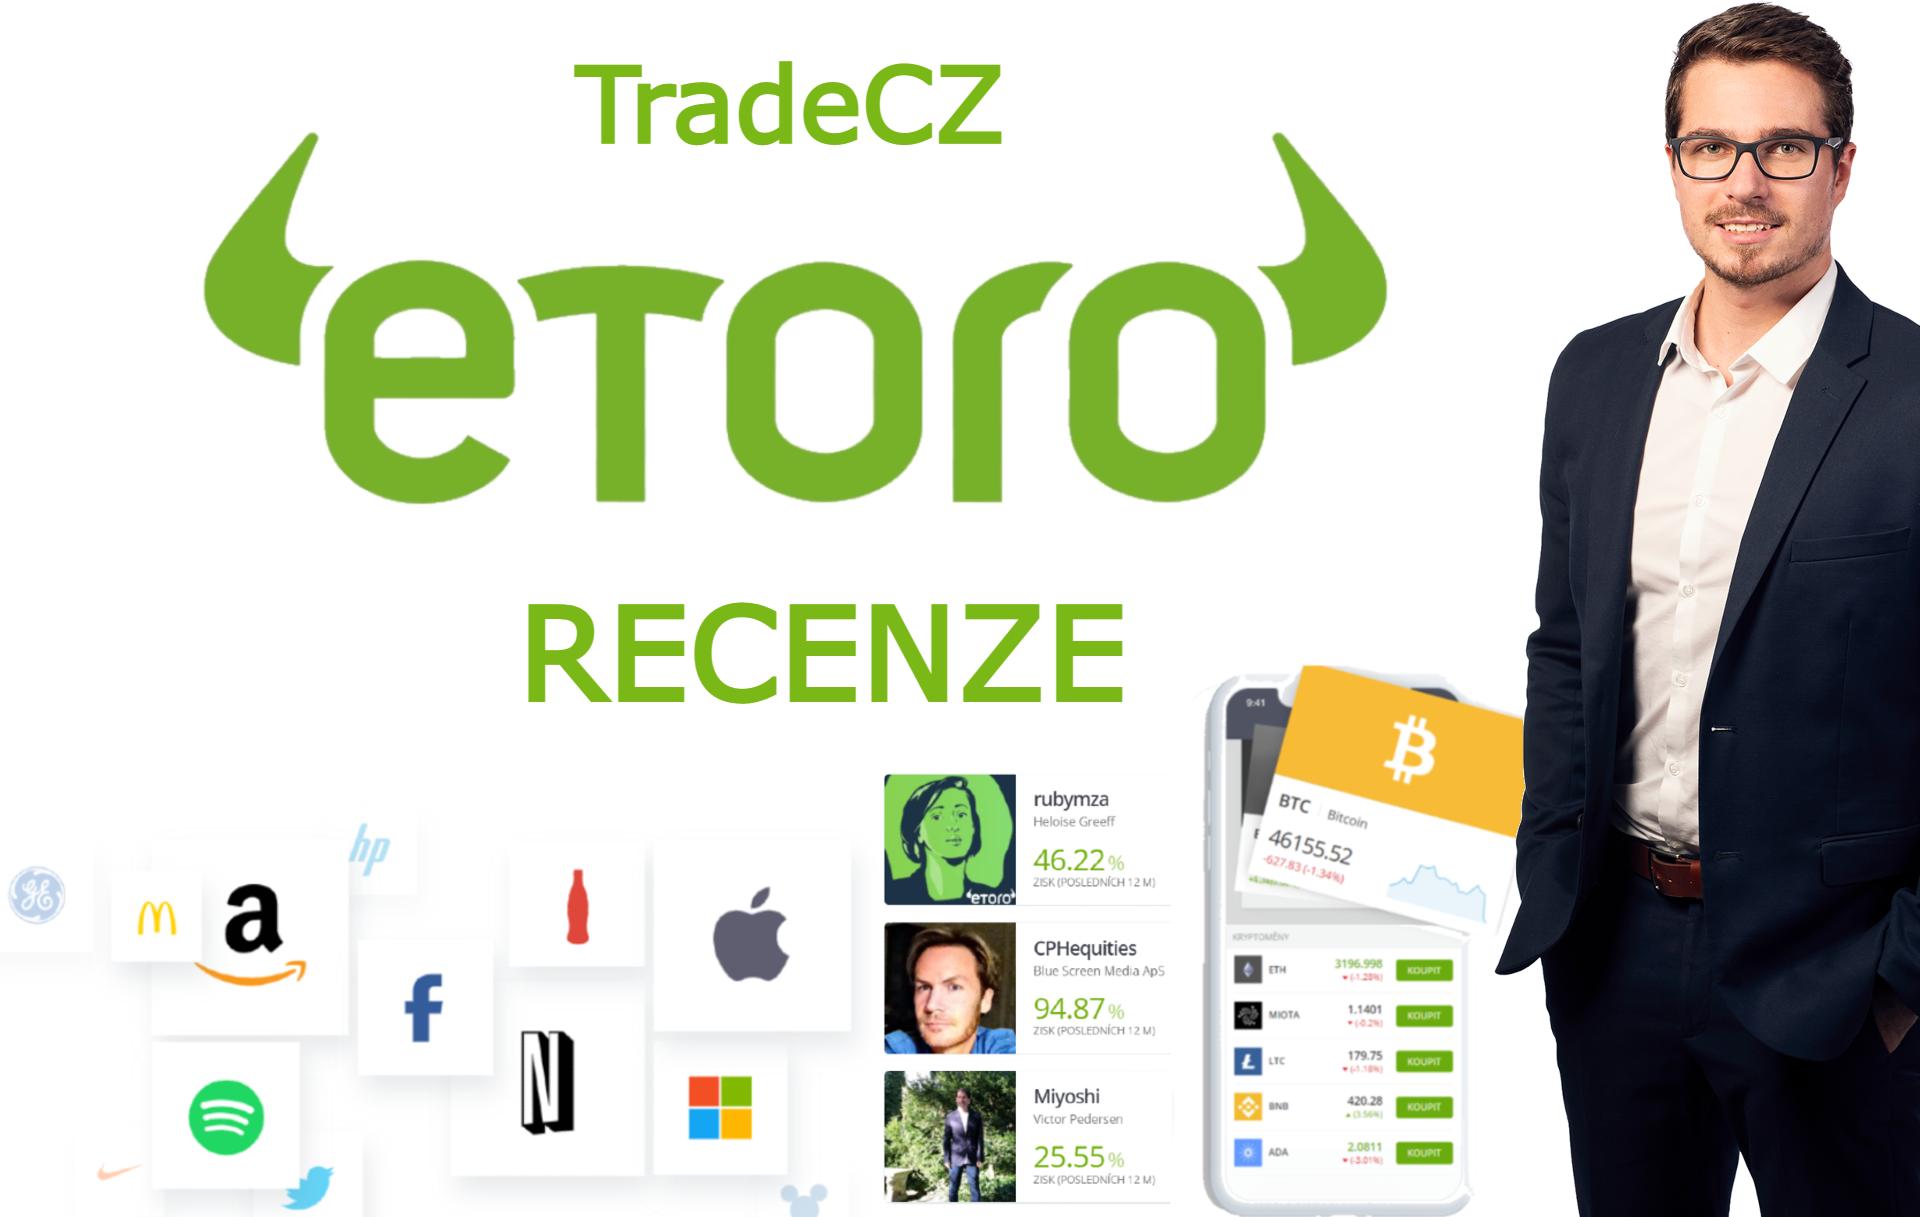 eToro broker recenze tradecz